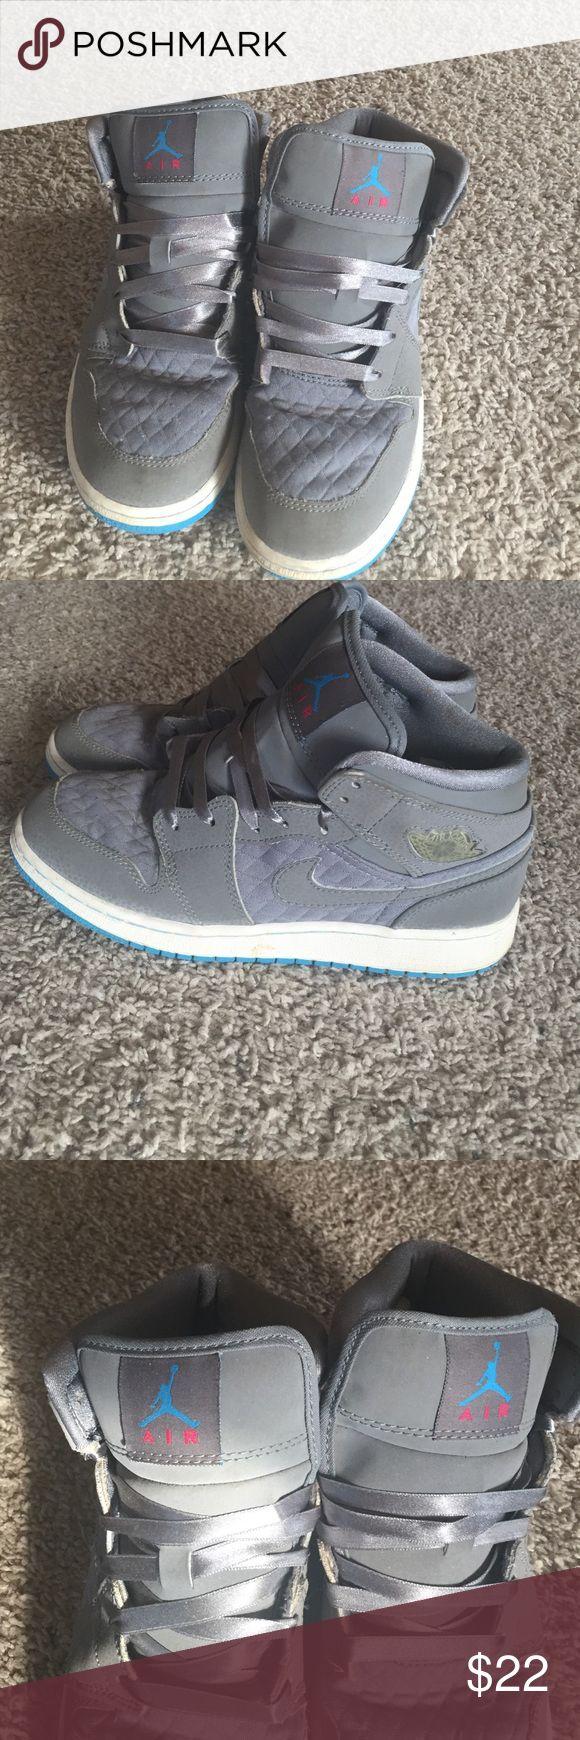 Air Jordan Girls high top tennis shoes Girls Air Jordan high top tennis shoes Air jordan Shoes Athletic Shoes